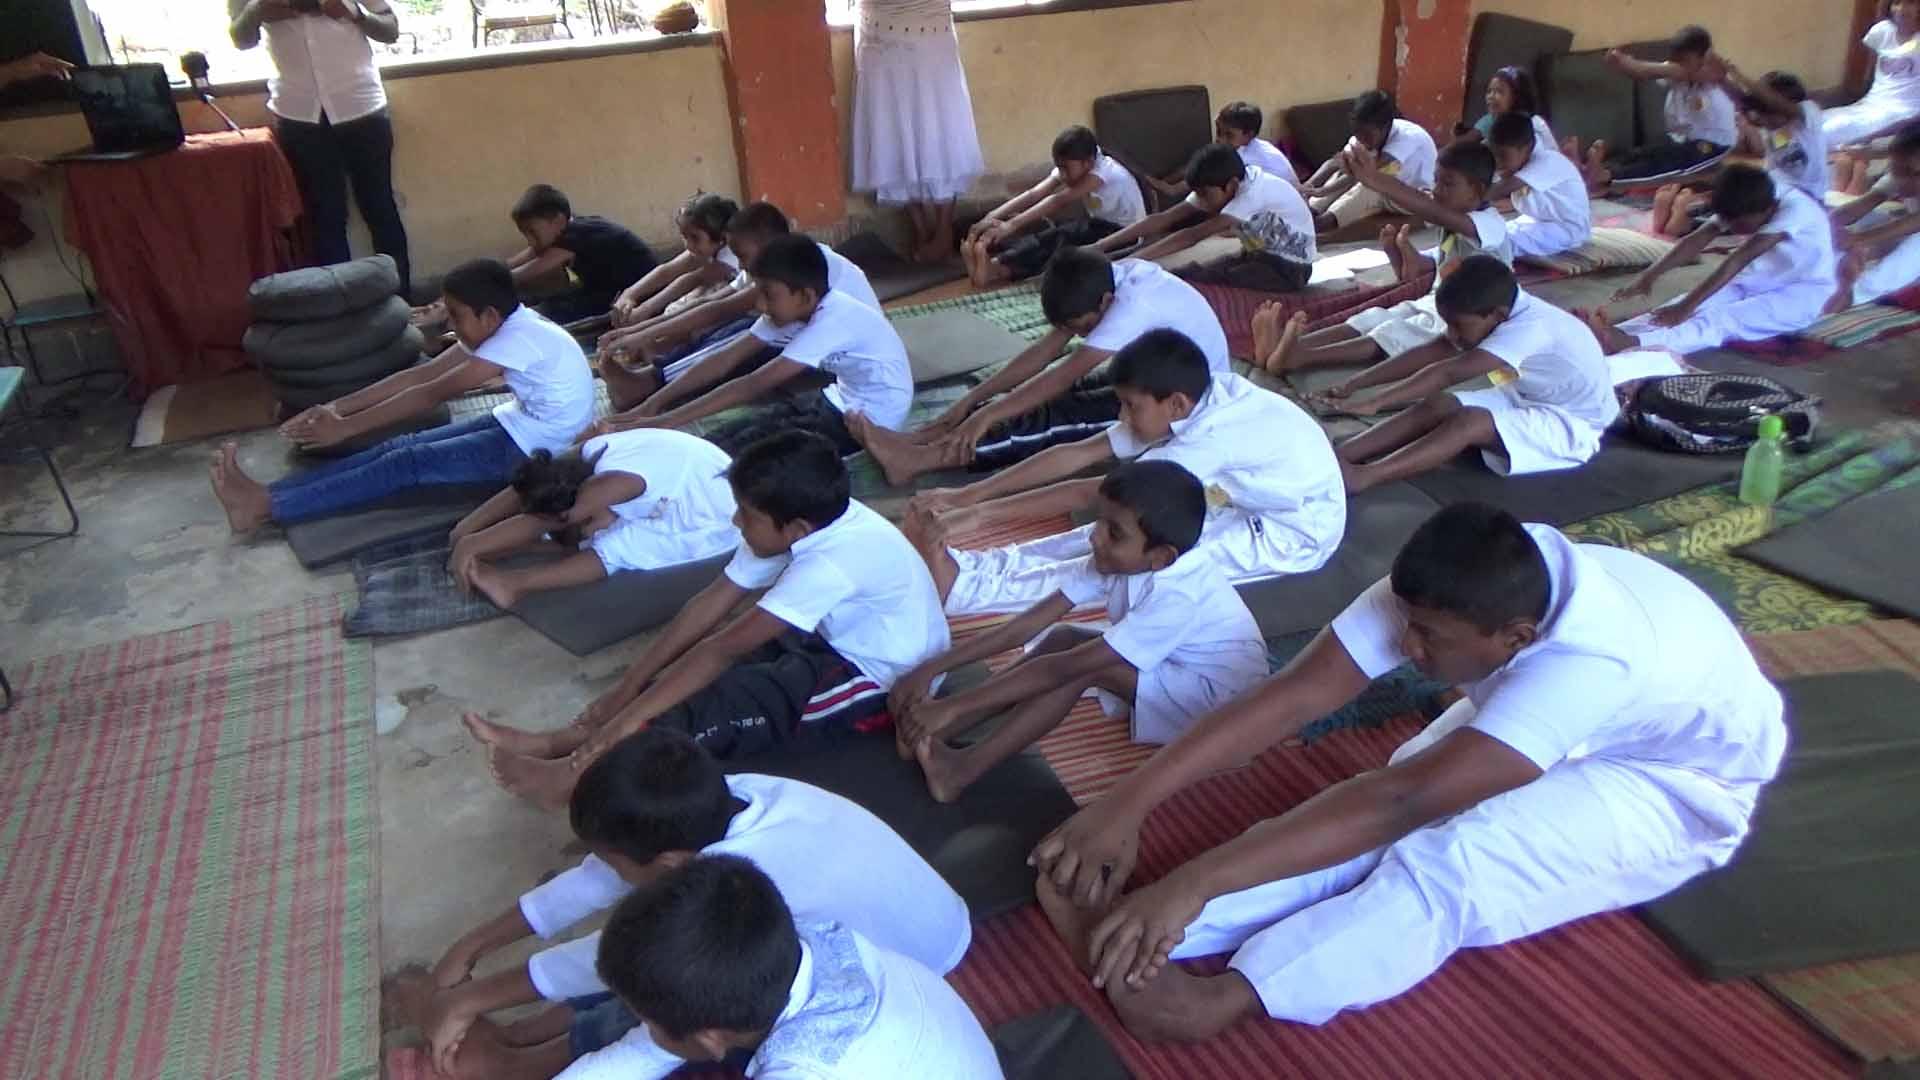 Sati Camp at Meethirigala Kanishta Vidyalaya-yoga session (8)